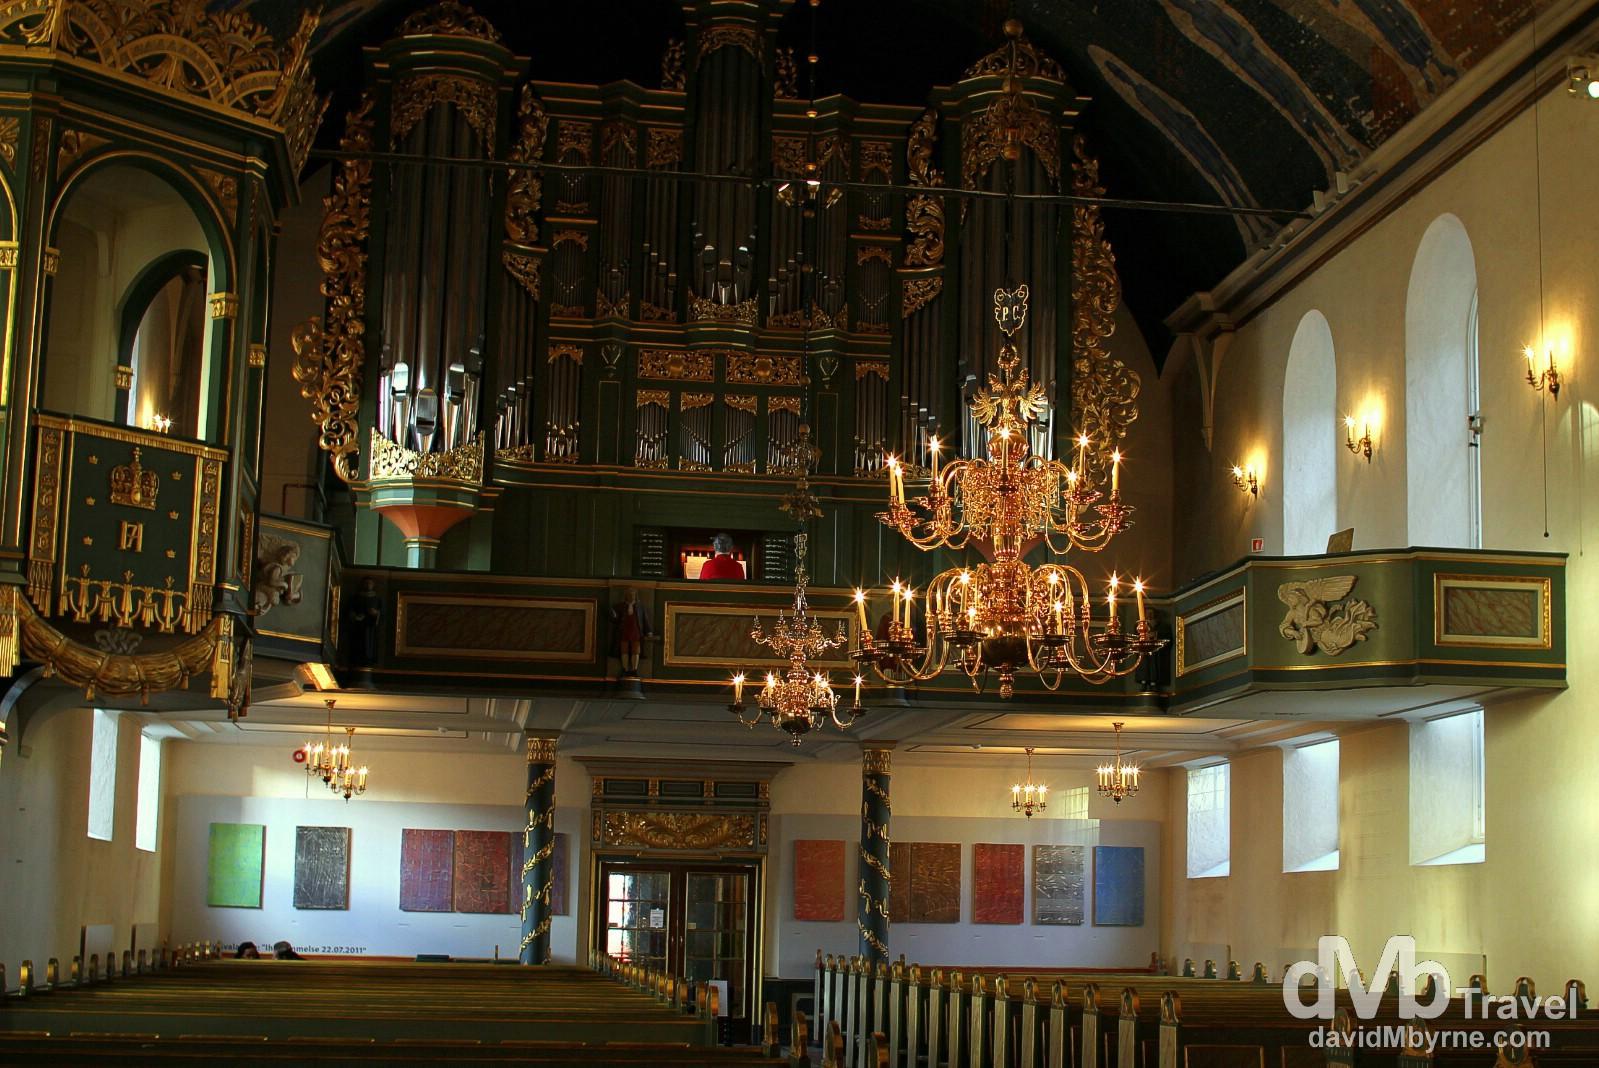 Organ practice in Oslo Cathedral, Oslo, Norway. November 29, 2012.